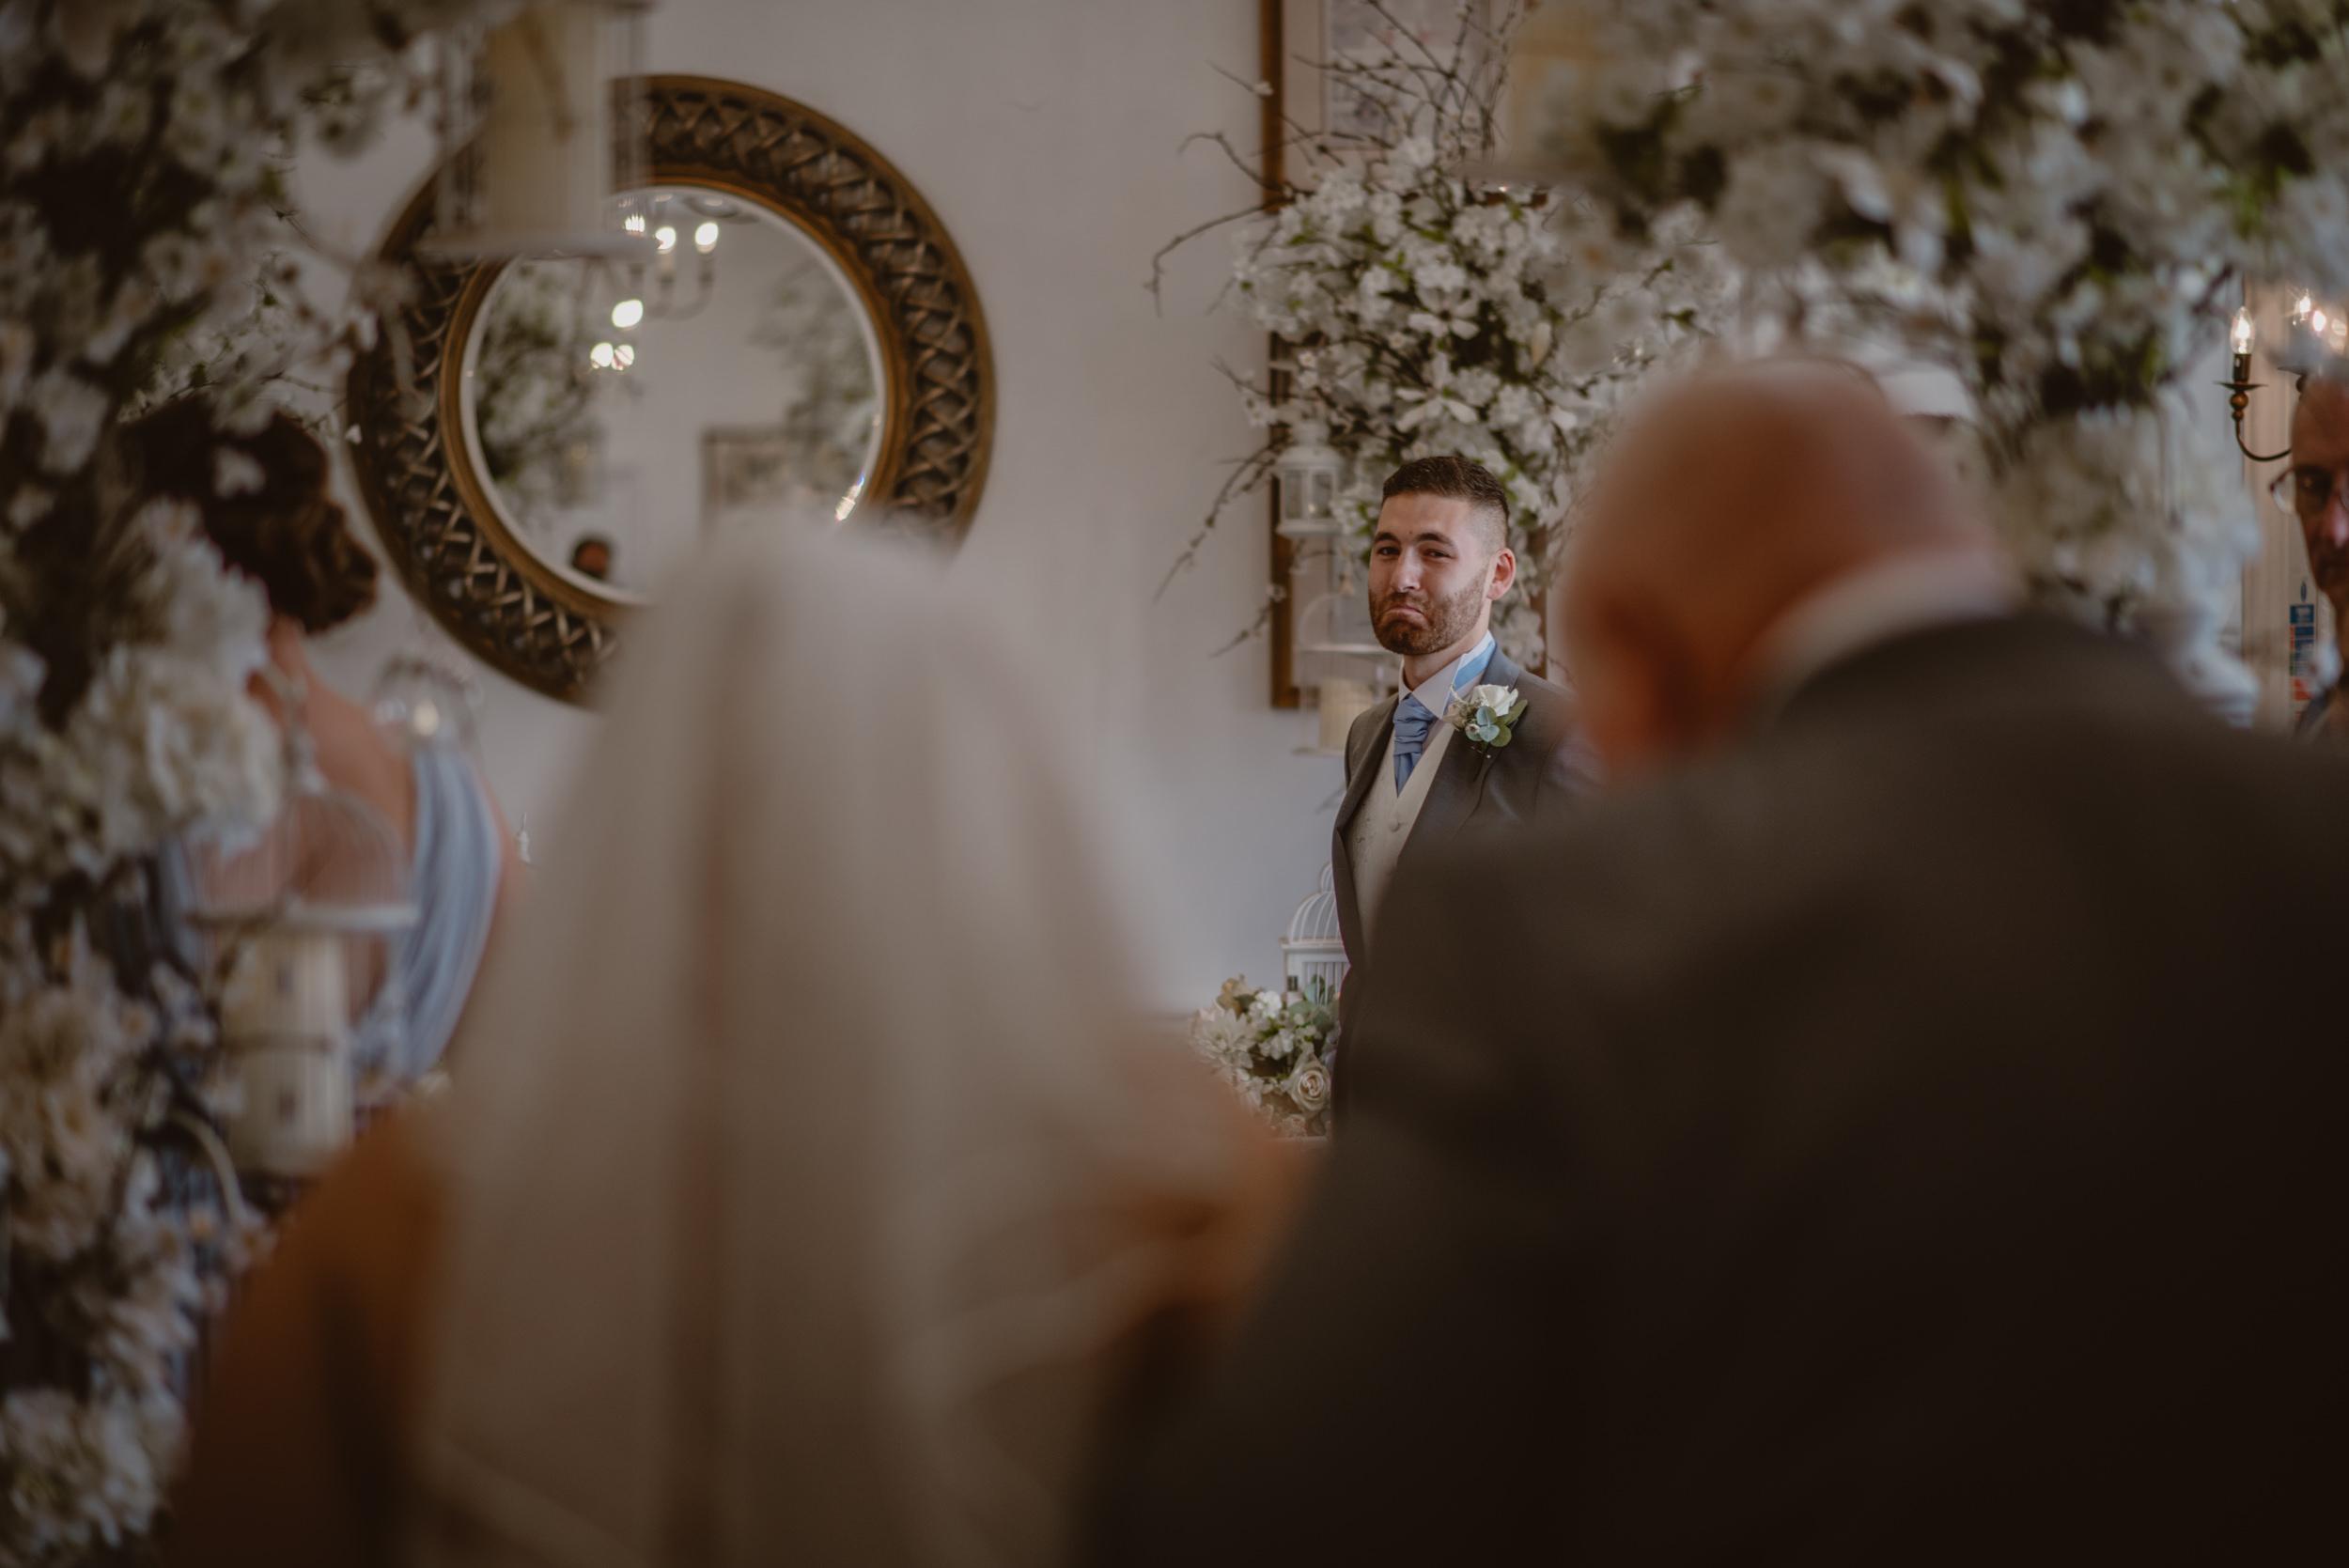 Rachel-and-James-Wedding-Horsley-Towers-State-Manu-Mendoza-Wedding-Photography-218.jpg